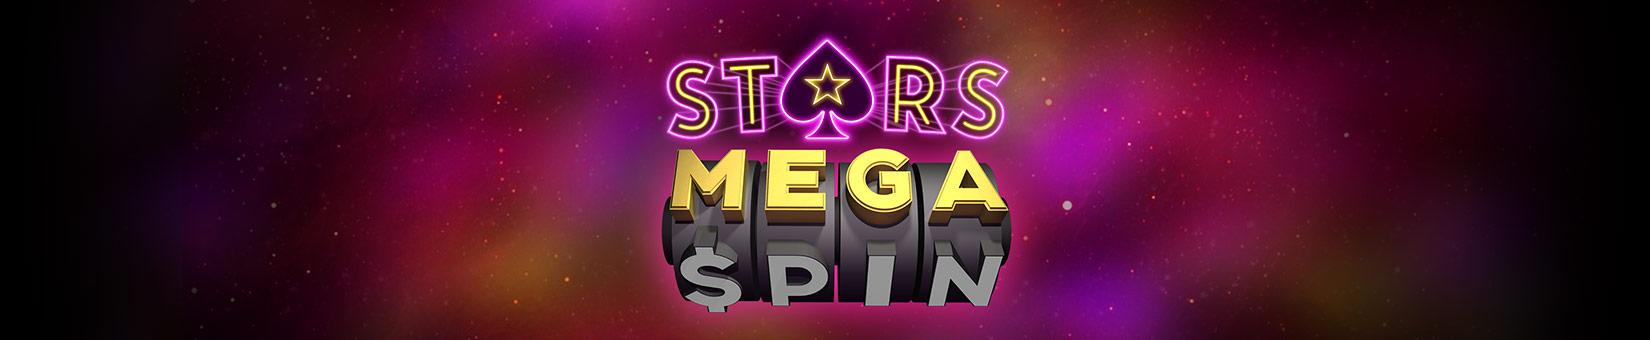 Tips para jugar poker online tragamonedas gratis Disco Spins-200713